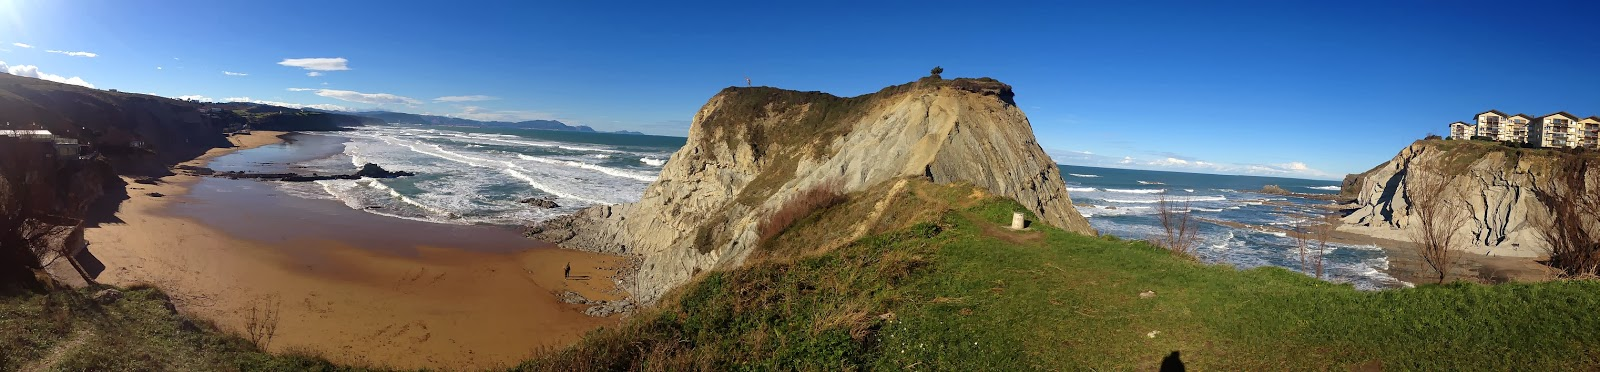 surf playa sopelana panoramica